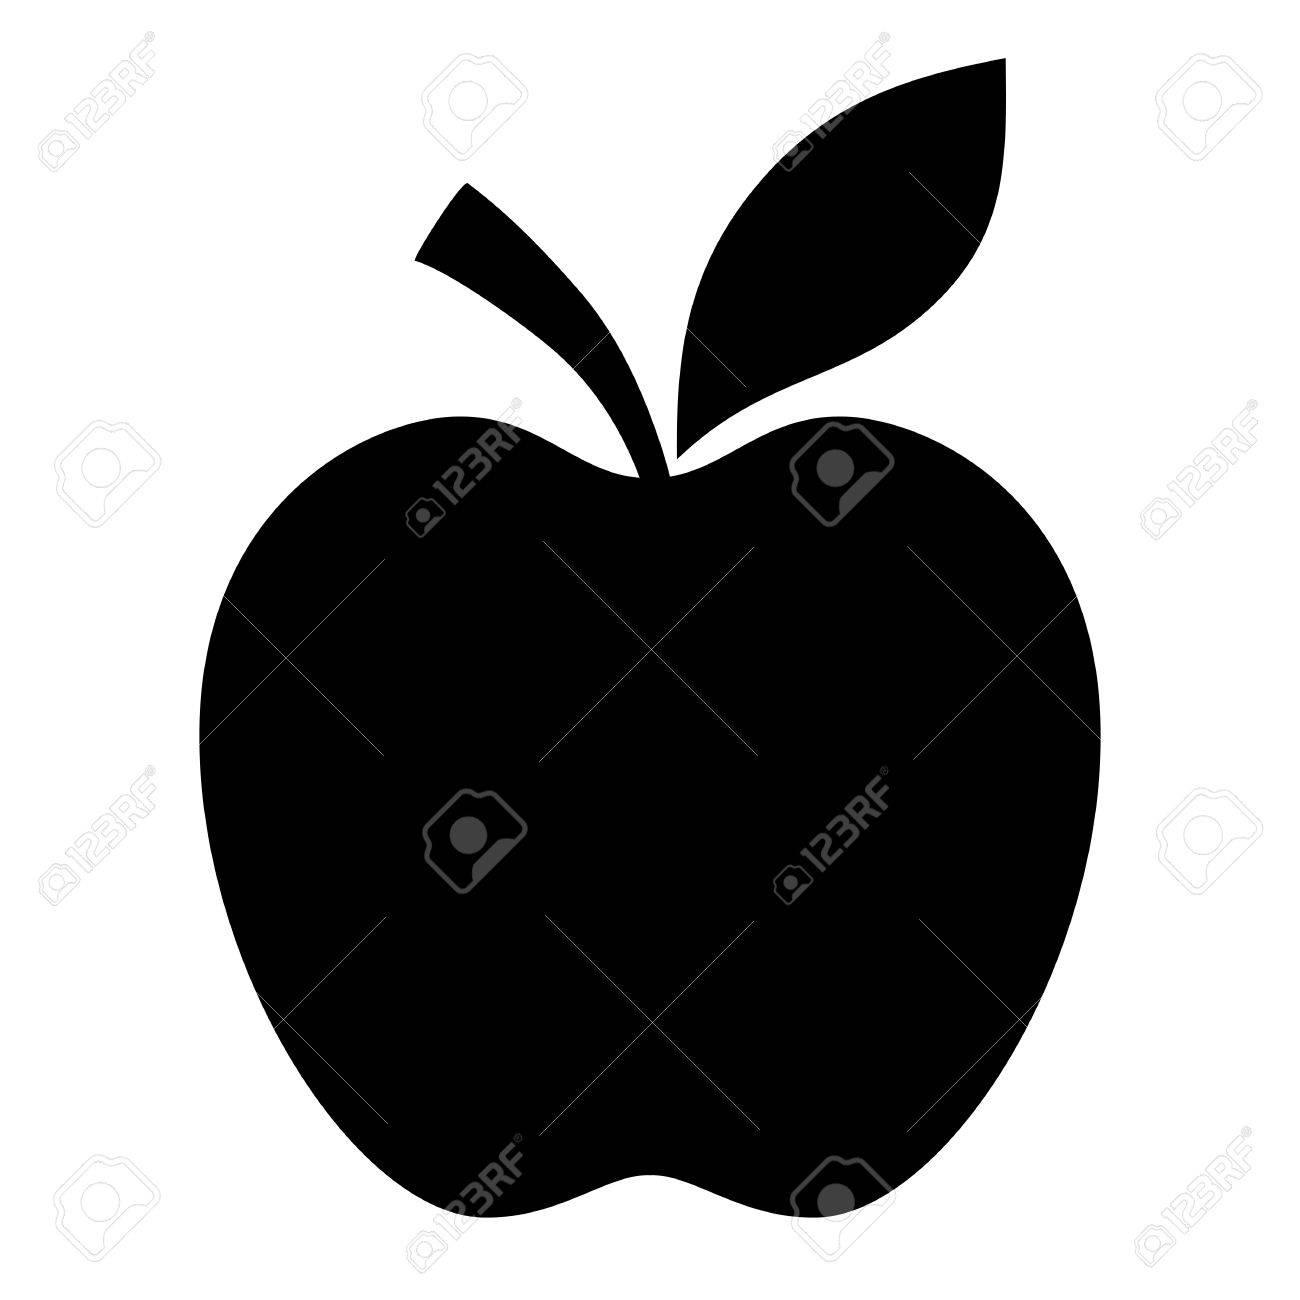 Apple black silhouette - 52082972